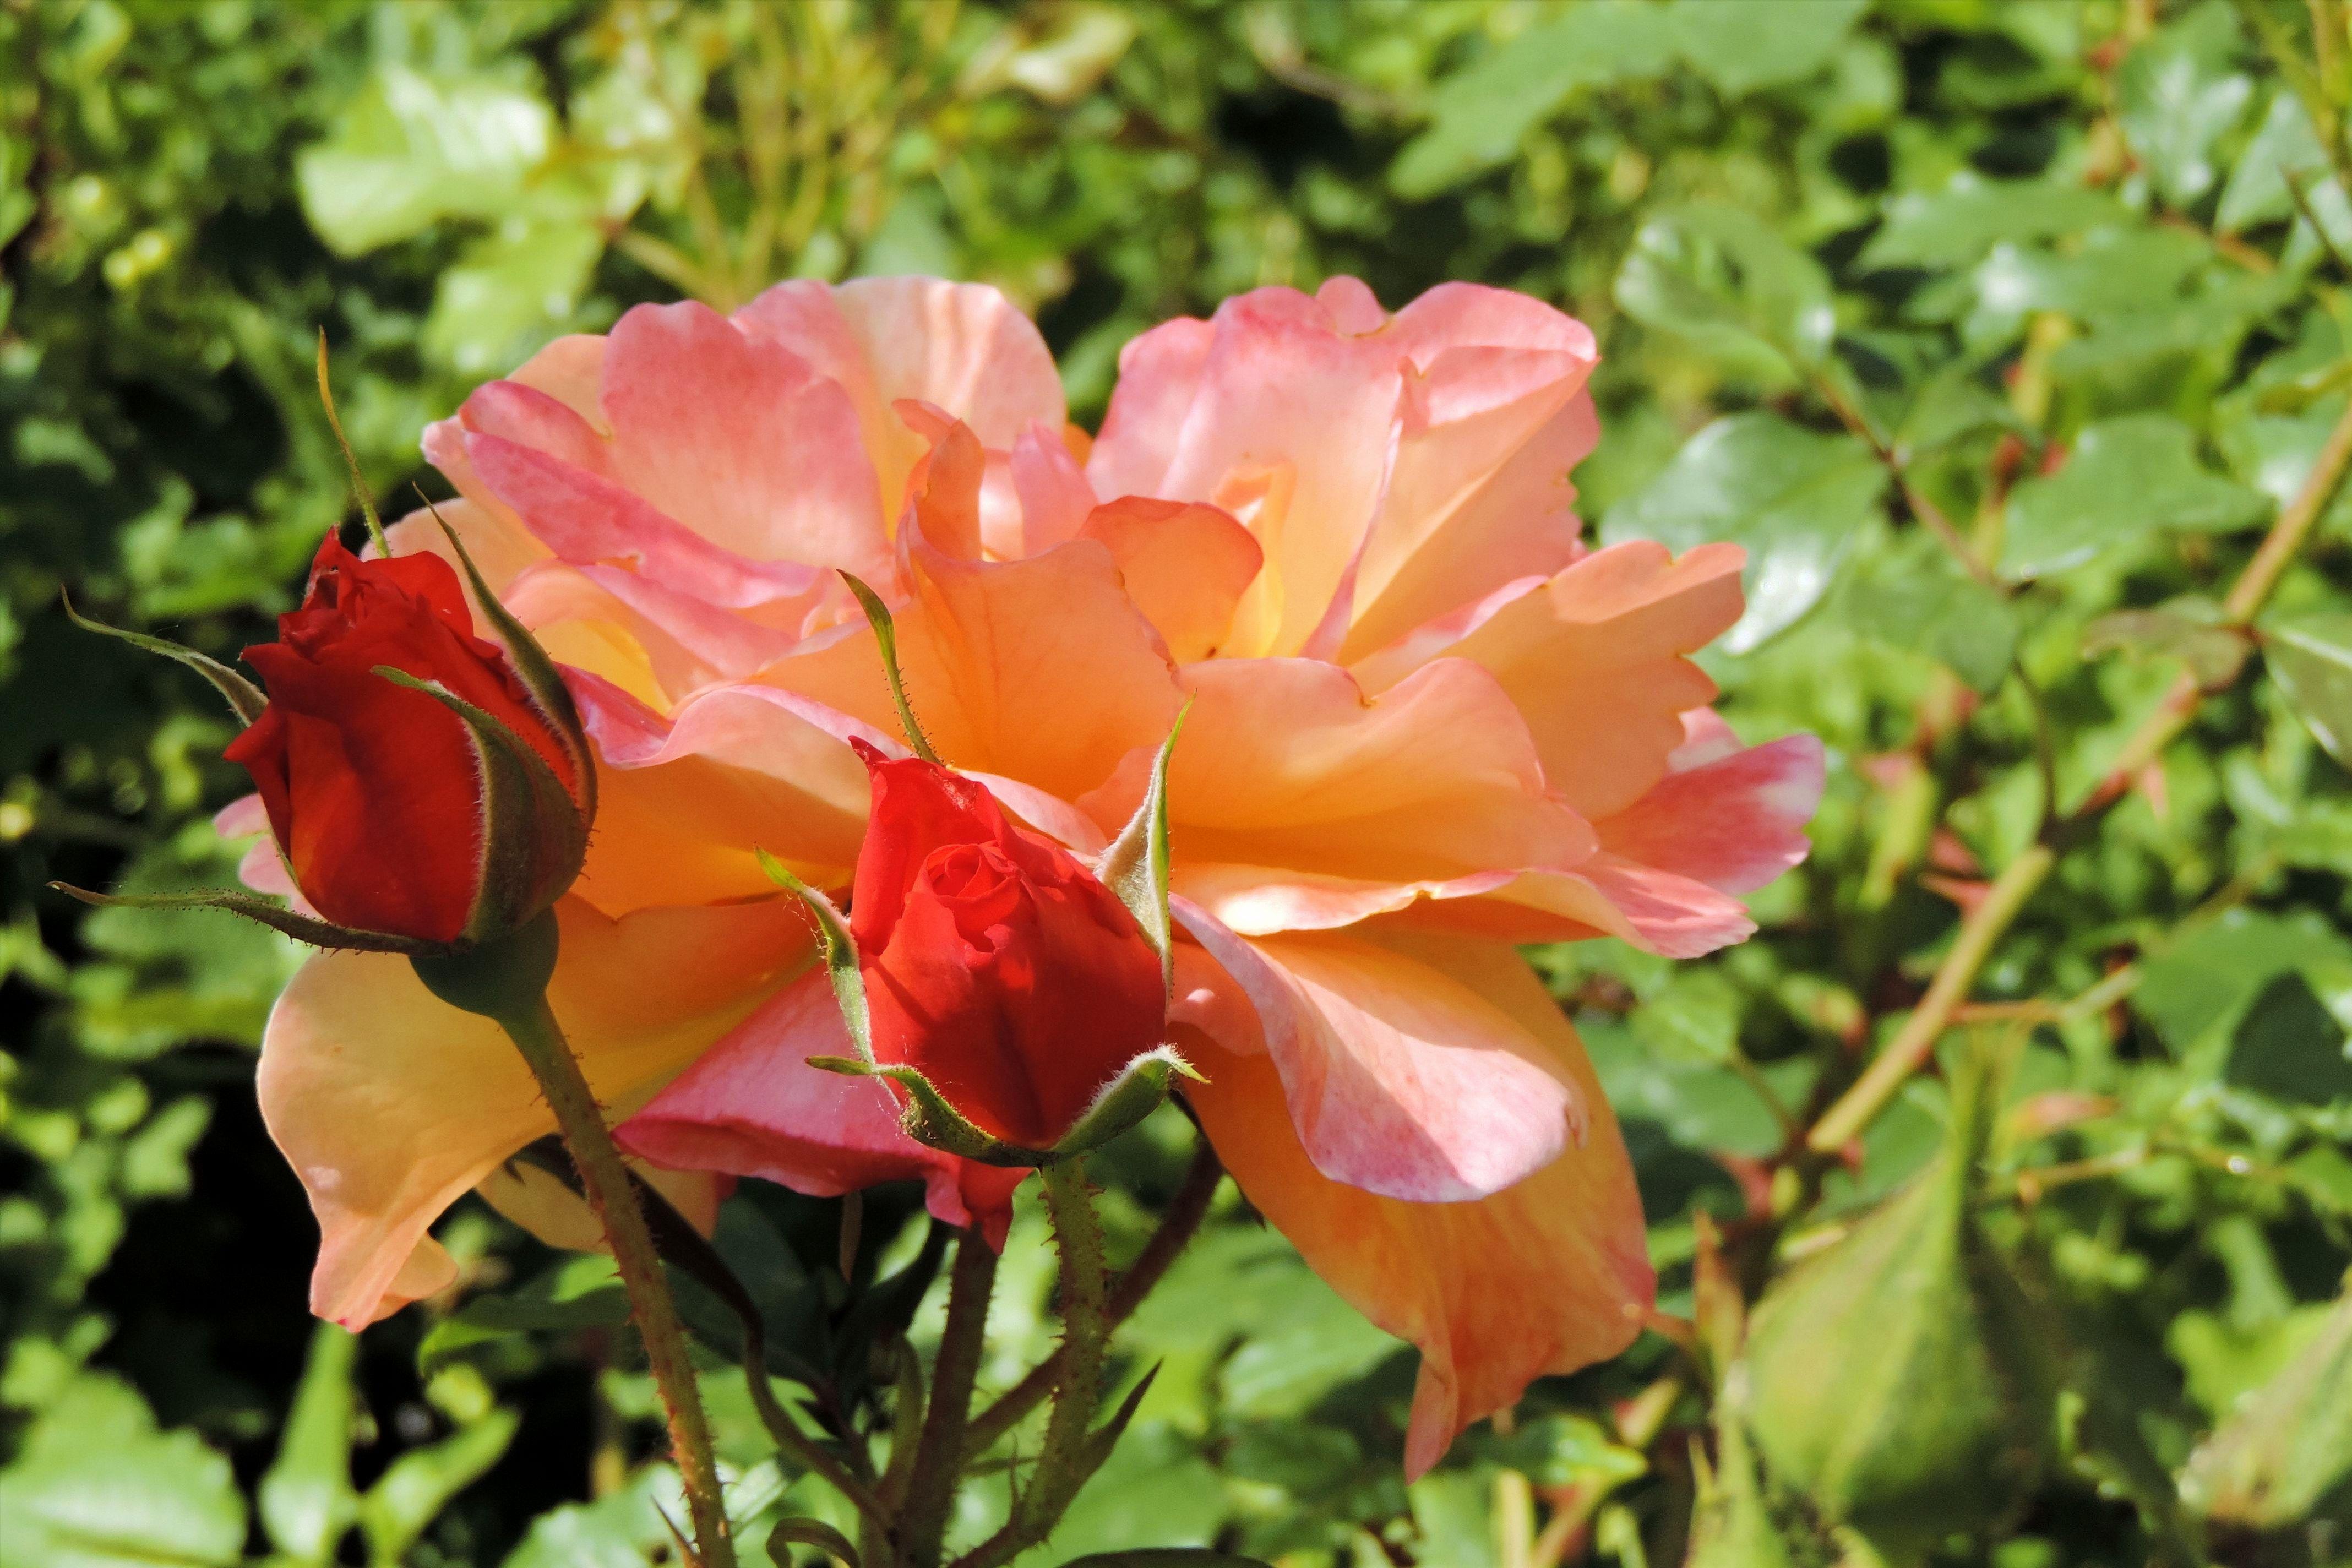 nature blossom plant flower petal bloom rose botany flora shrub smell floribunda rose bloom flowering plant